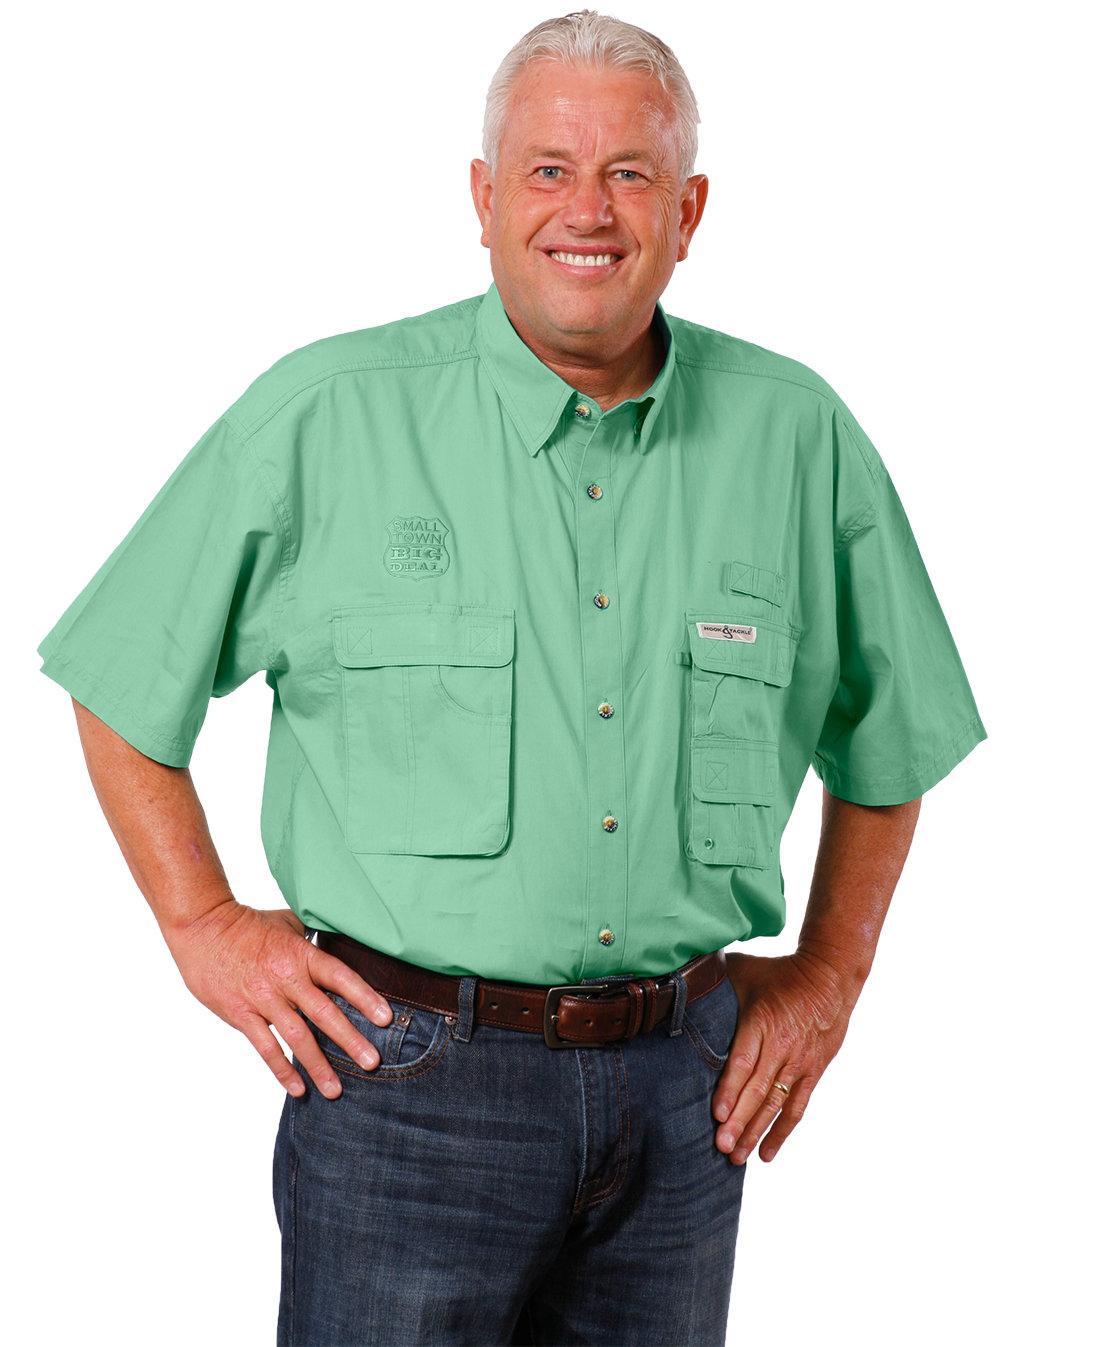 Hook & Tackle Men's Gulf Stream Short-Sleeve Fishing Shirt